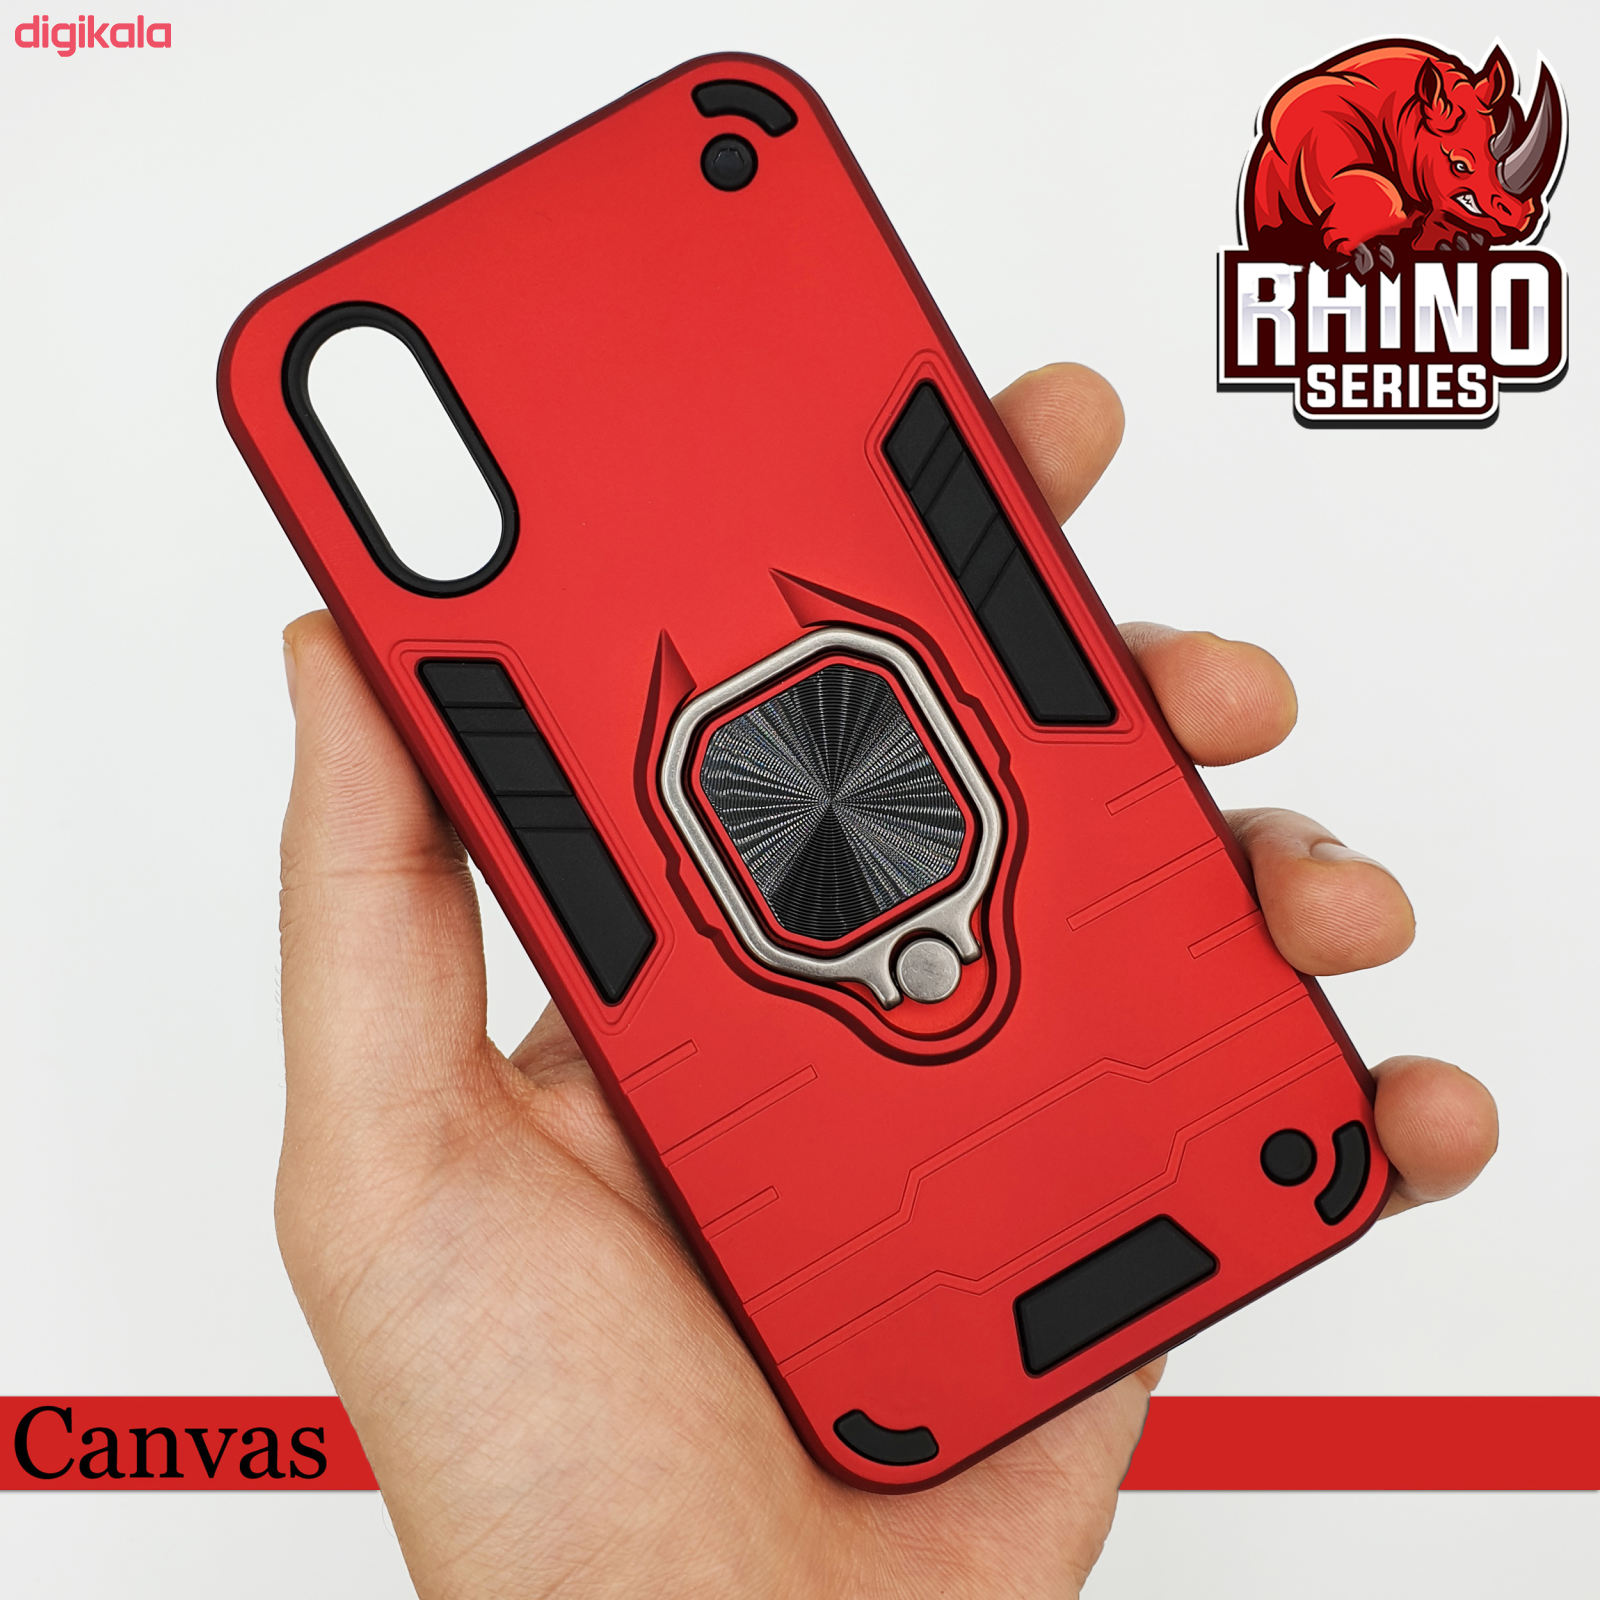 کاور کانواس مدل RHINO SERIES مناسب برای گوشی موبایل سامسونگ Galaxy A50s/A30s/A50 main 1 4